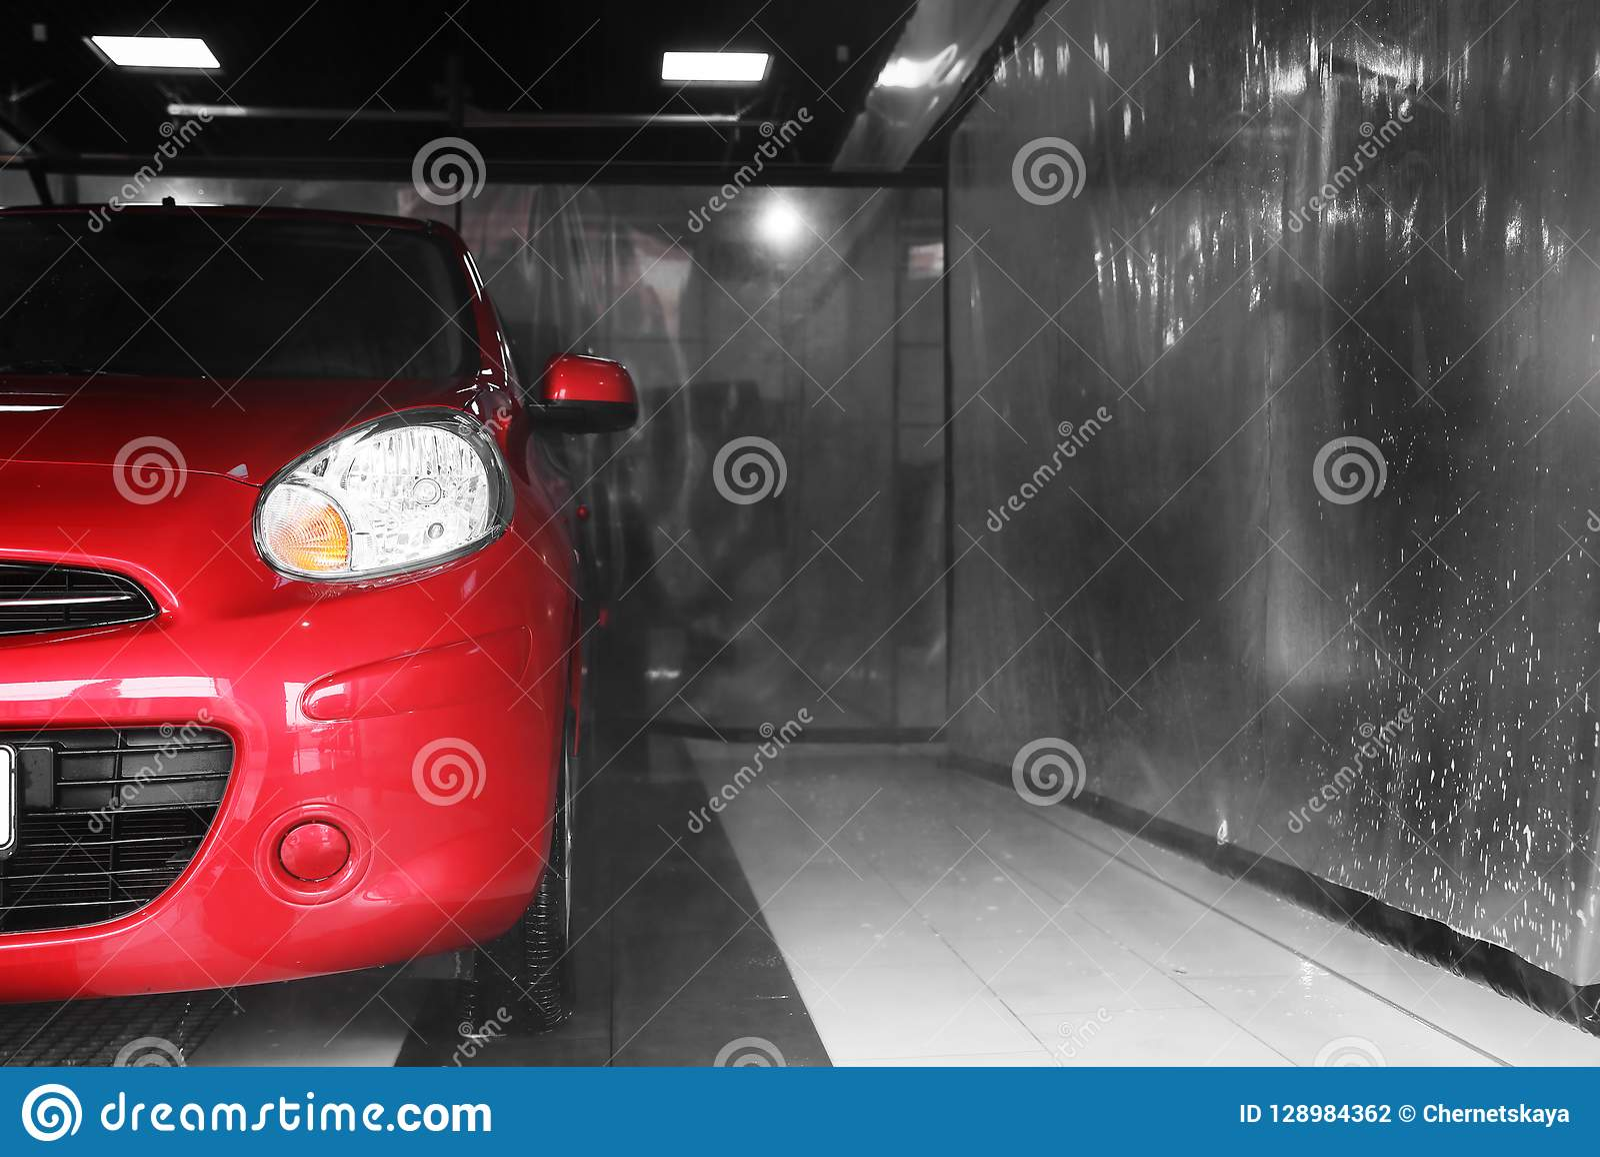 Red auto car wash